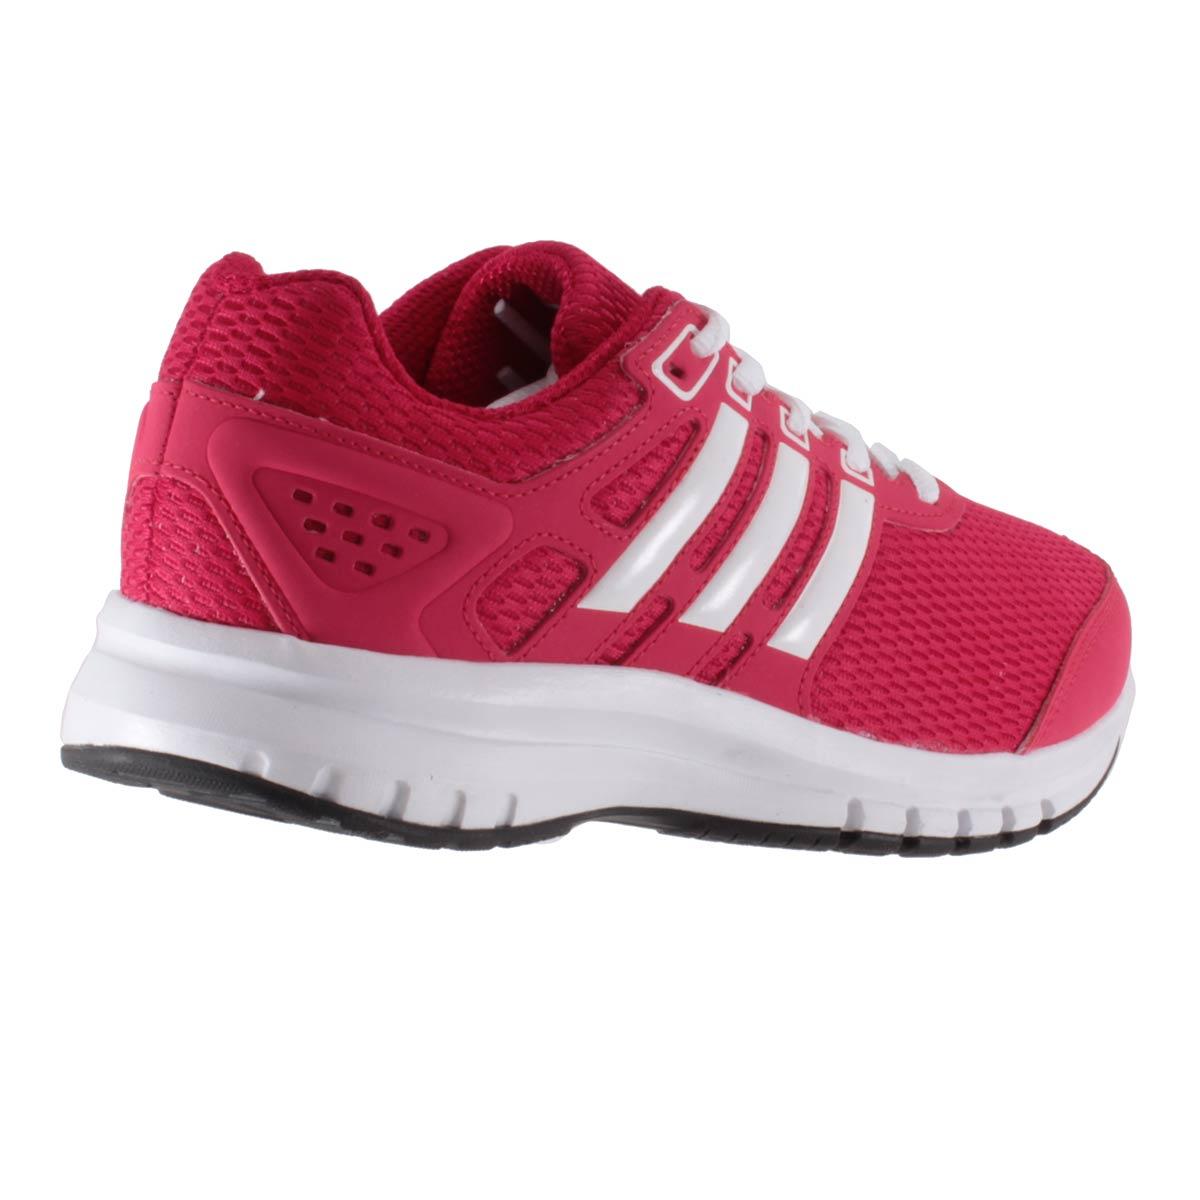 Tênis Adidas Duramo Lite Feminino Caminhada Corrida